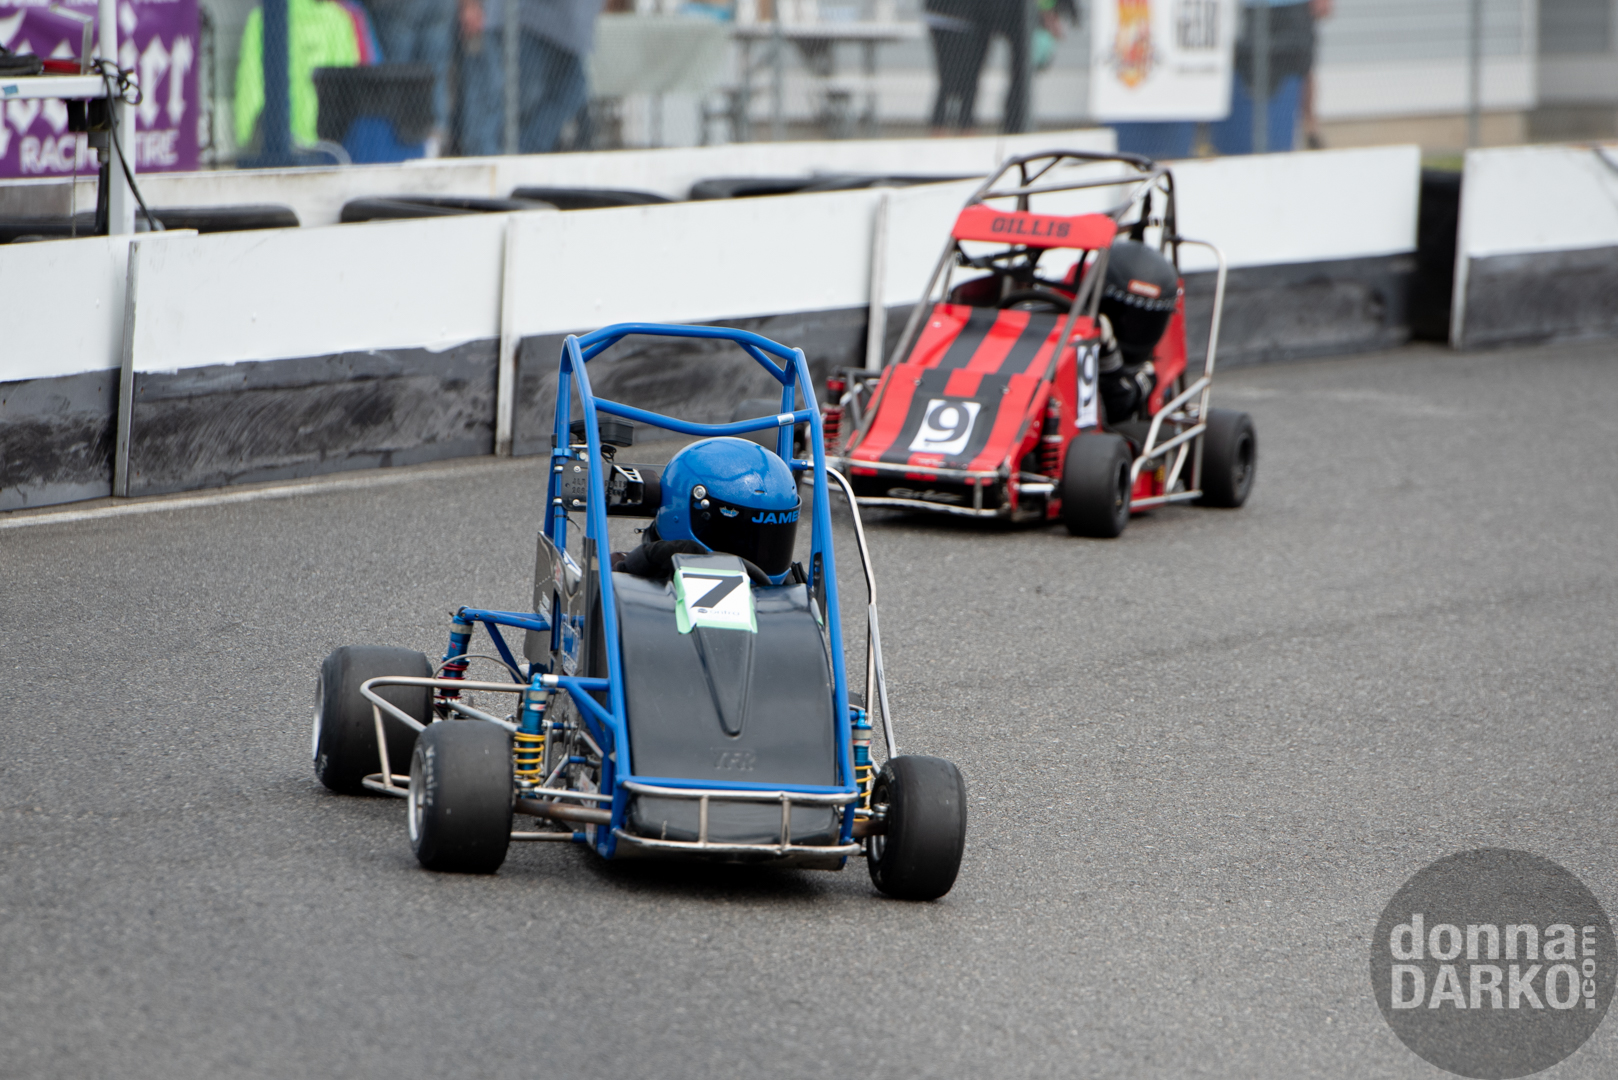 QWMA (Racing) 8-11-2019 DSC_7484.jpg